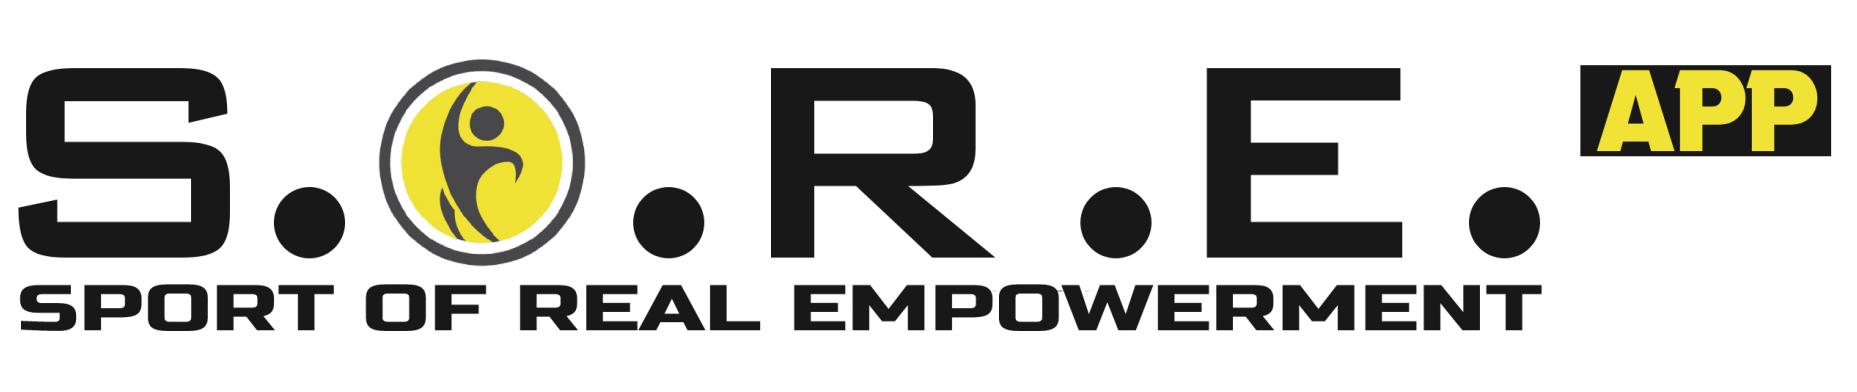 SoreApp Logo